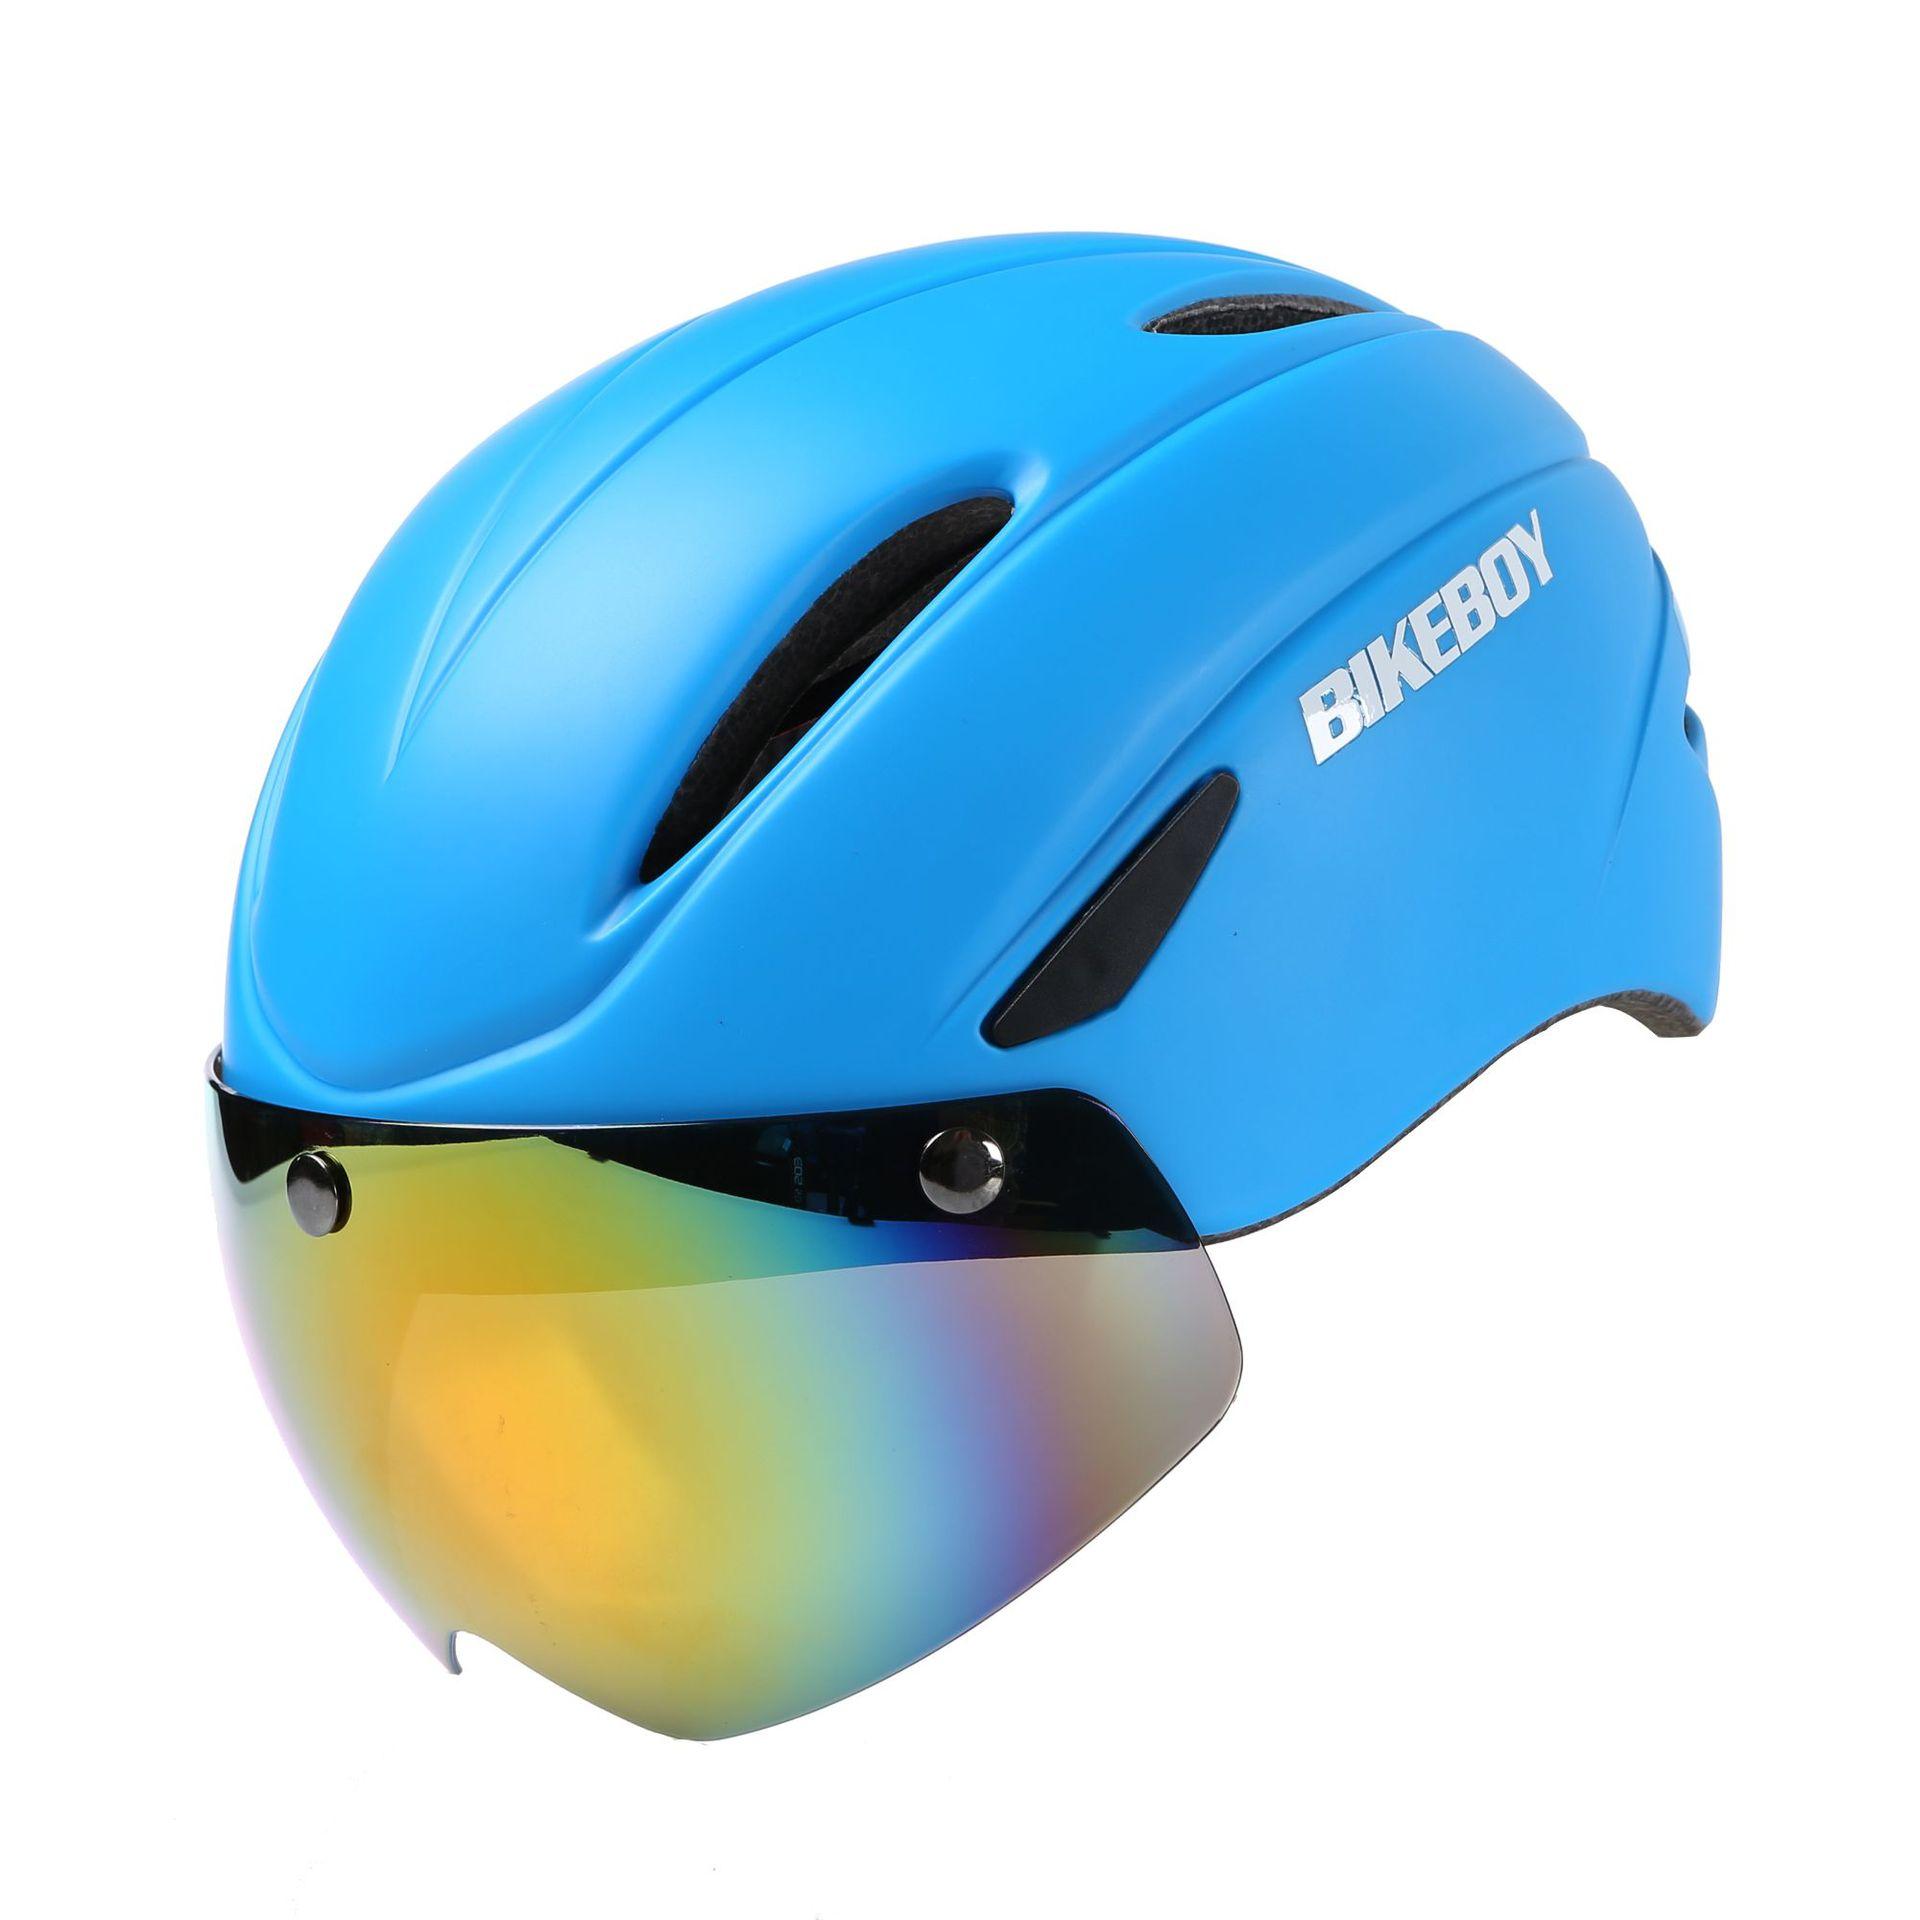 Bikeboy Riding Helmet Glasses One-piece Men Road Bike Mountain Bike Helmet Bicycle Helmet Restraint Goggles Matte blue_Free size - gray lenses